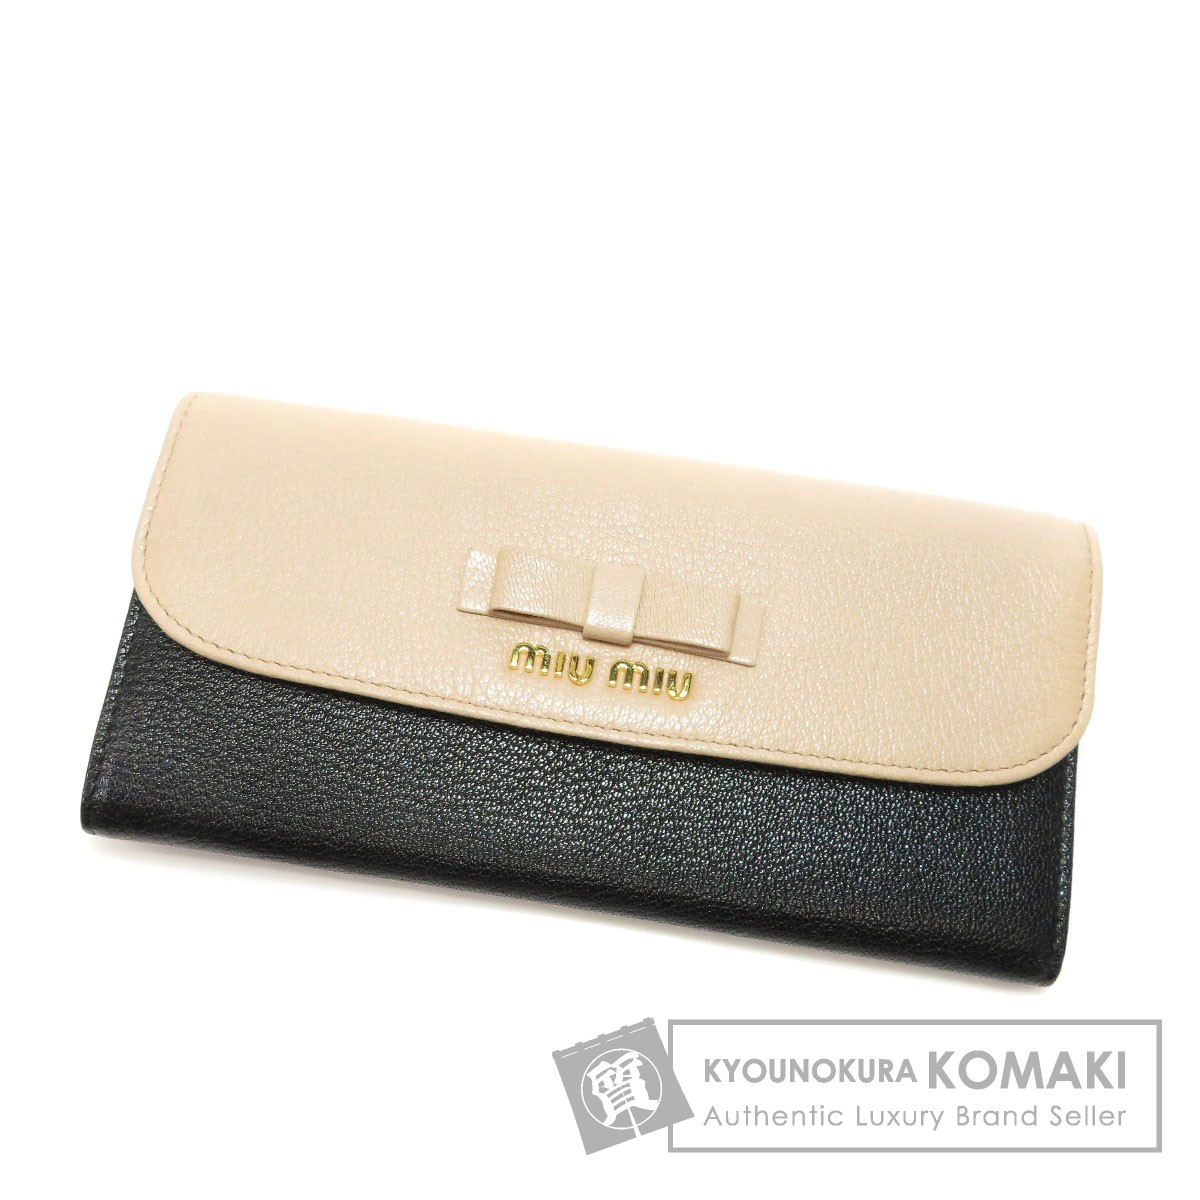 MIUMIU パスケース付き 長財布(小銭入れあり) レザー レディース 【中古】【ミュウミュウ】